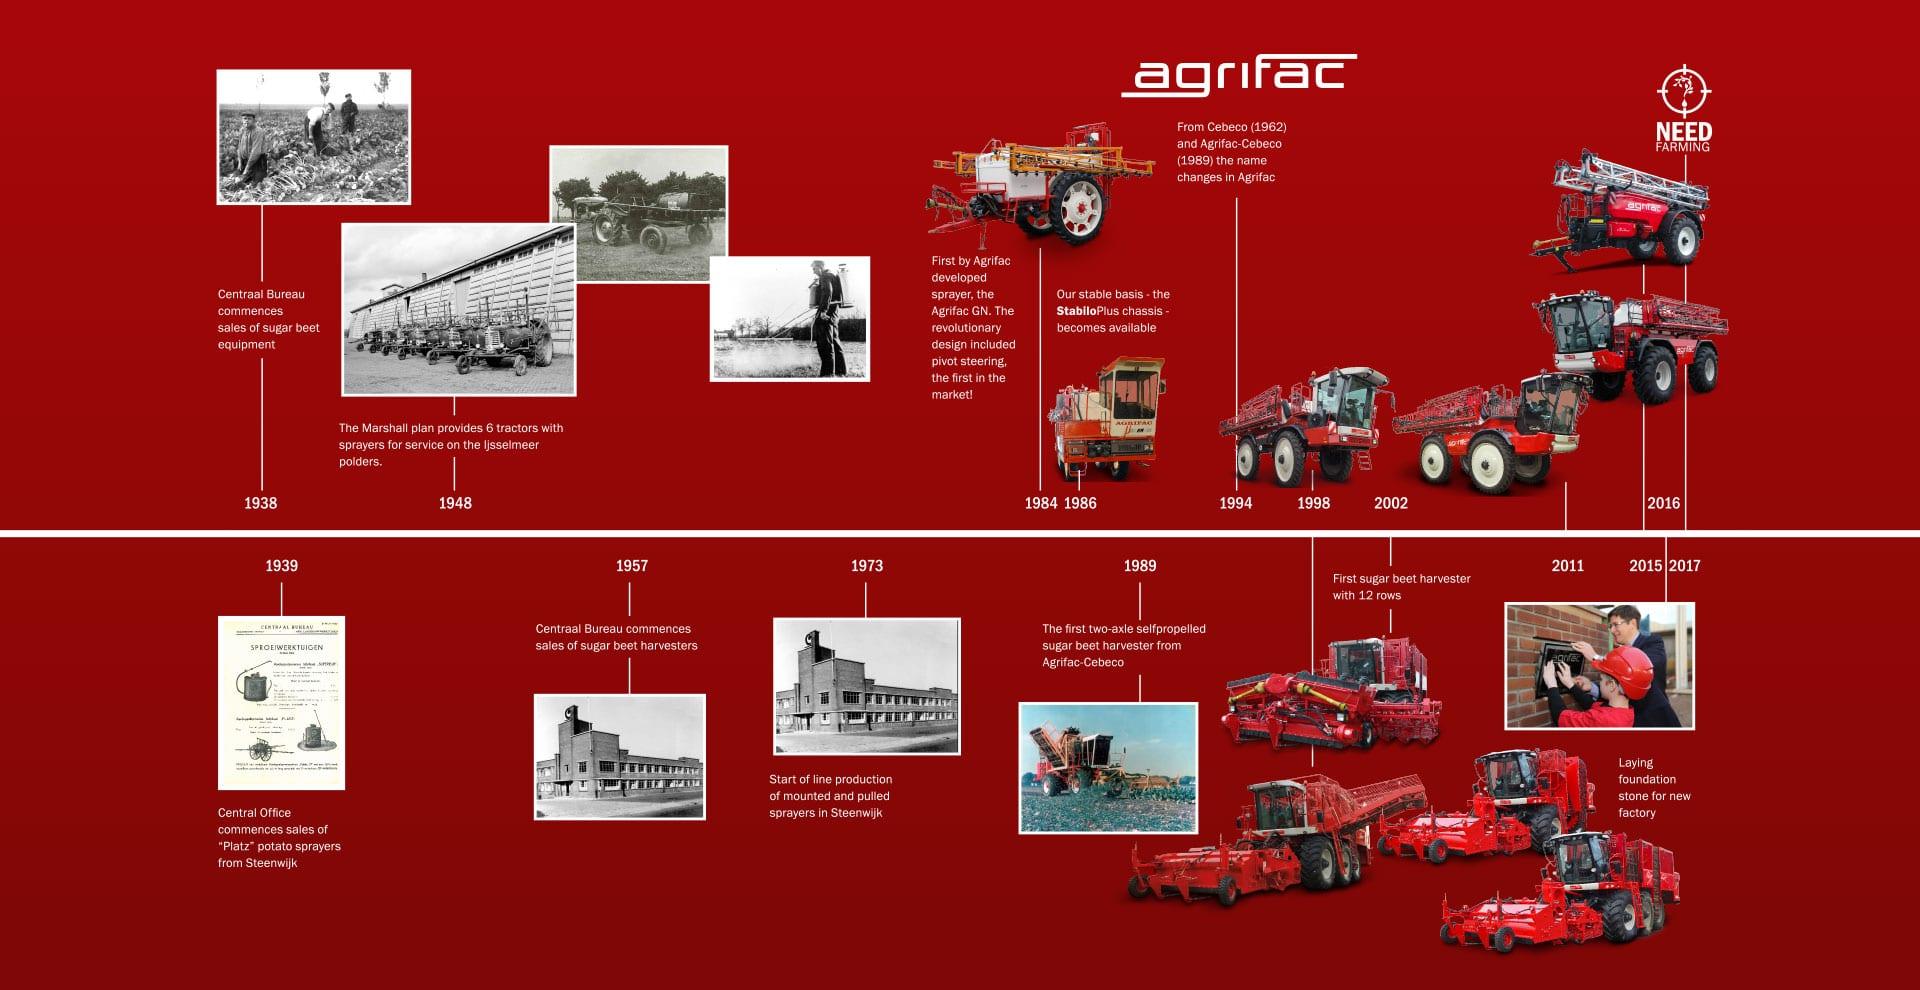 Agrifac machinery timeline